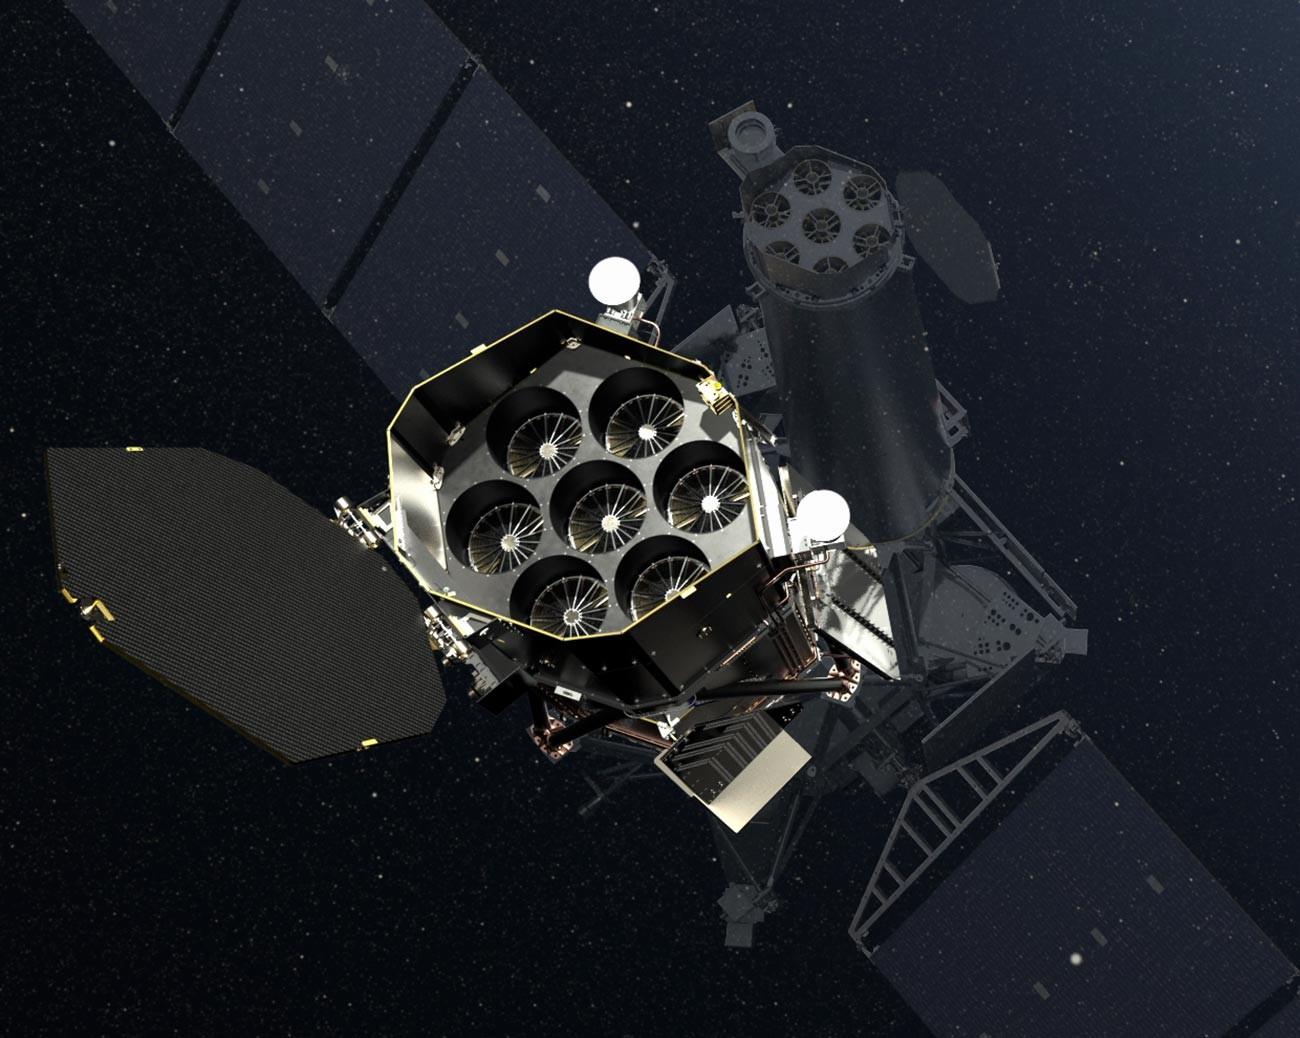 Observatorium luar angkasa Spektr-RG.